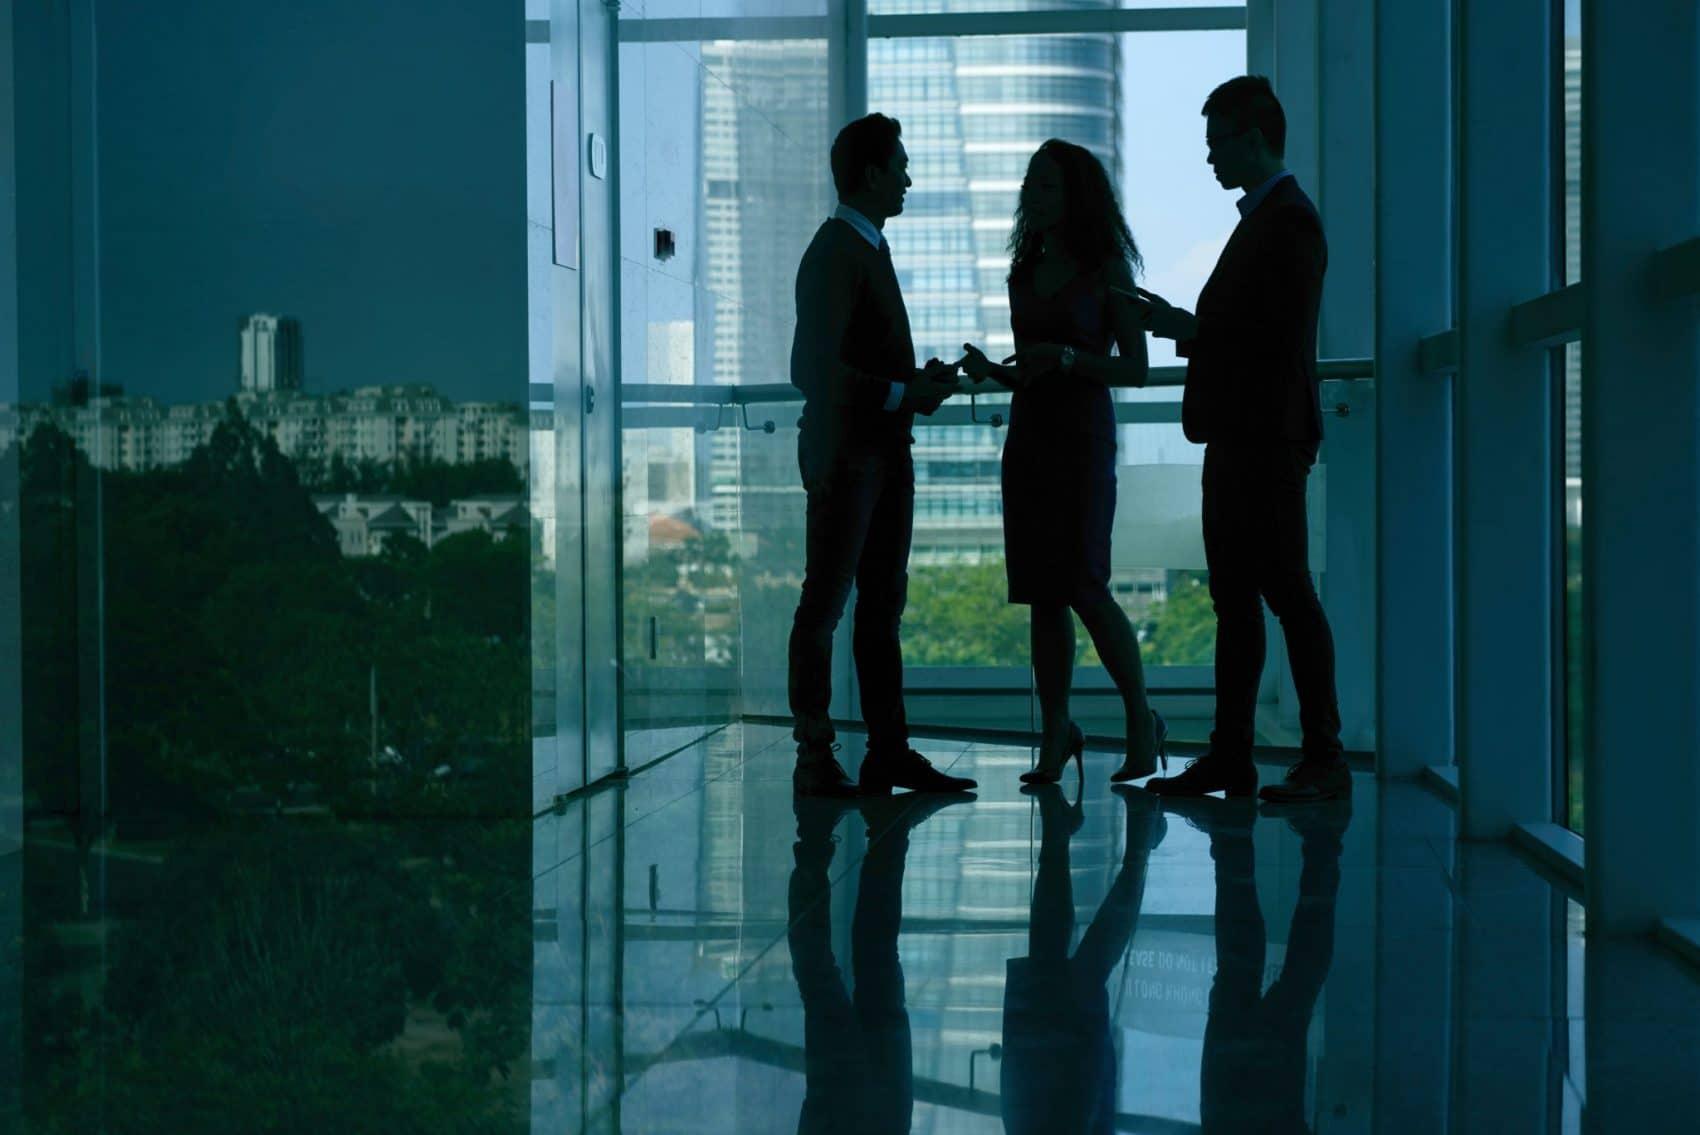 Let's Have A Chat : Top 25 MBA Entrepreneurship Programs